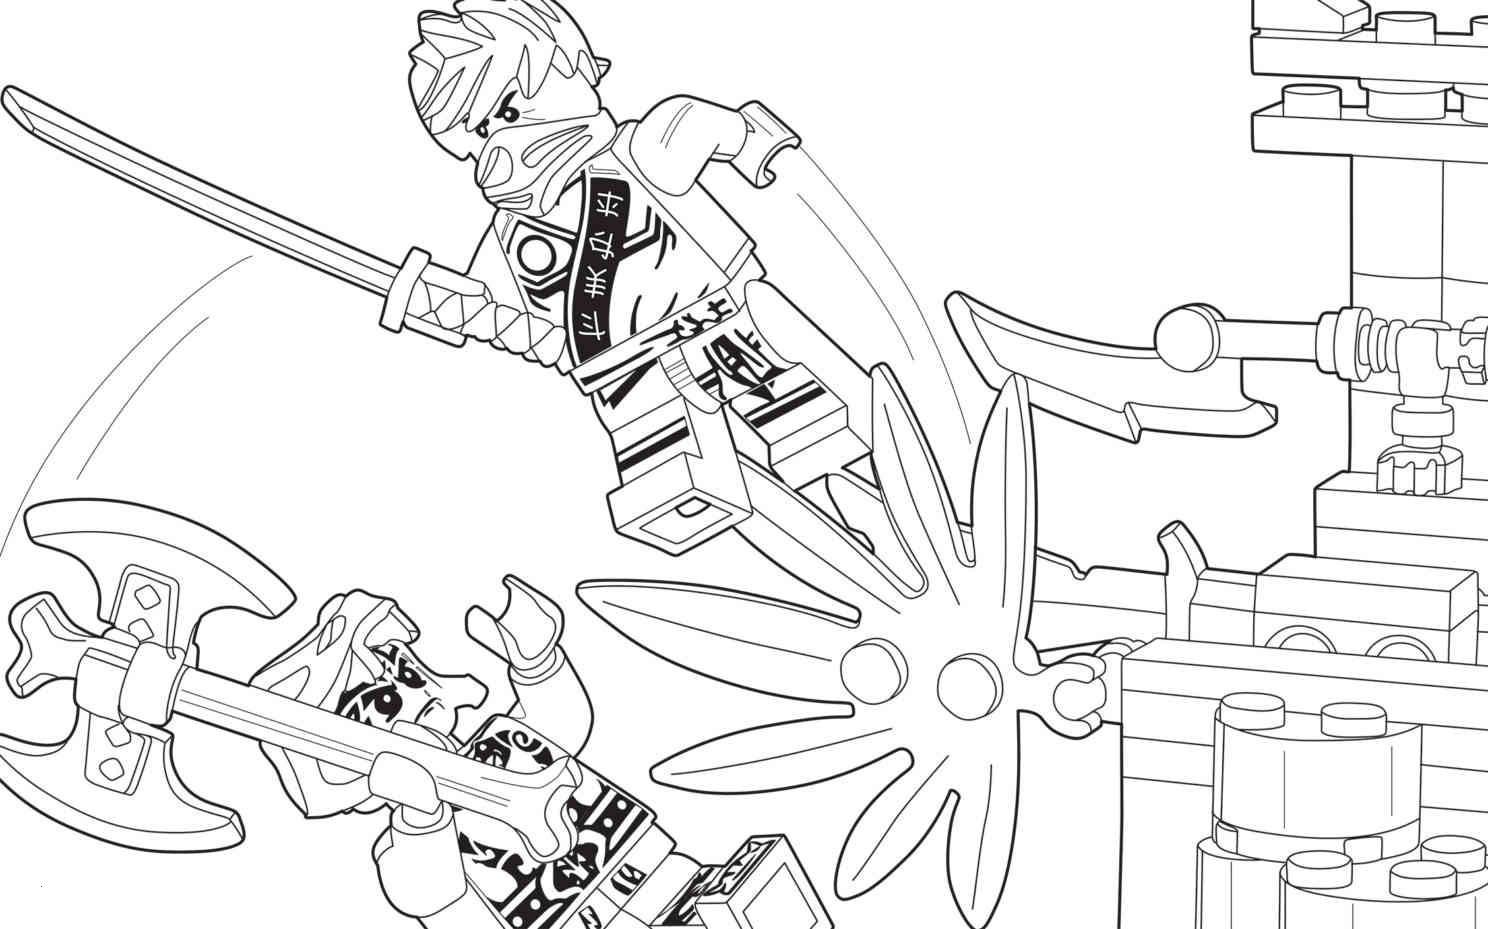 Ausmalbilder Ninjago Zane Inspirierend Ninjago Malvorlagen Zum Ausdrucken Schön 37 Lego Ninjago Lloyd Das Bild